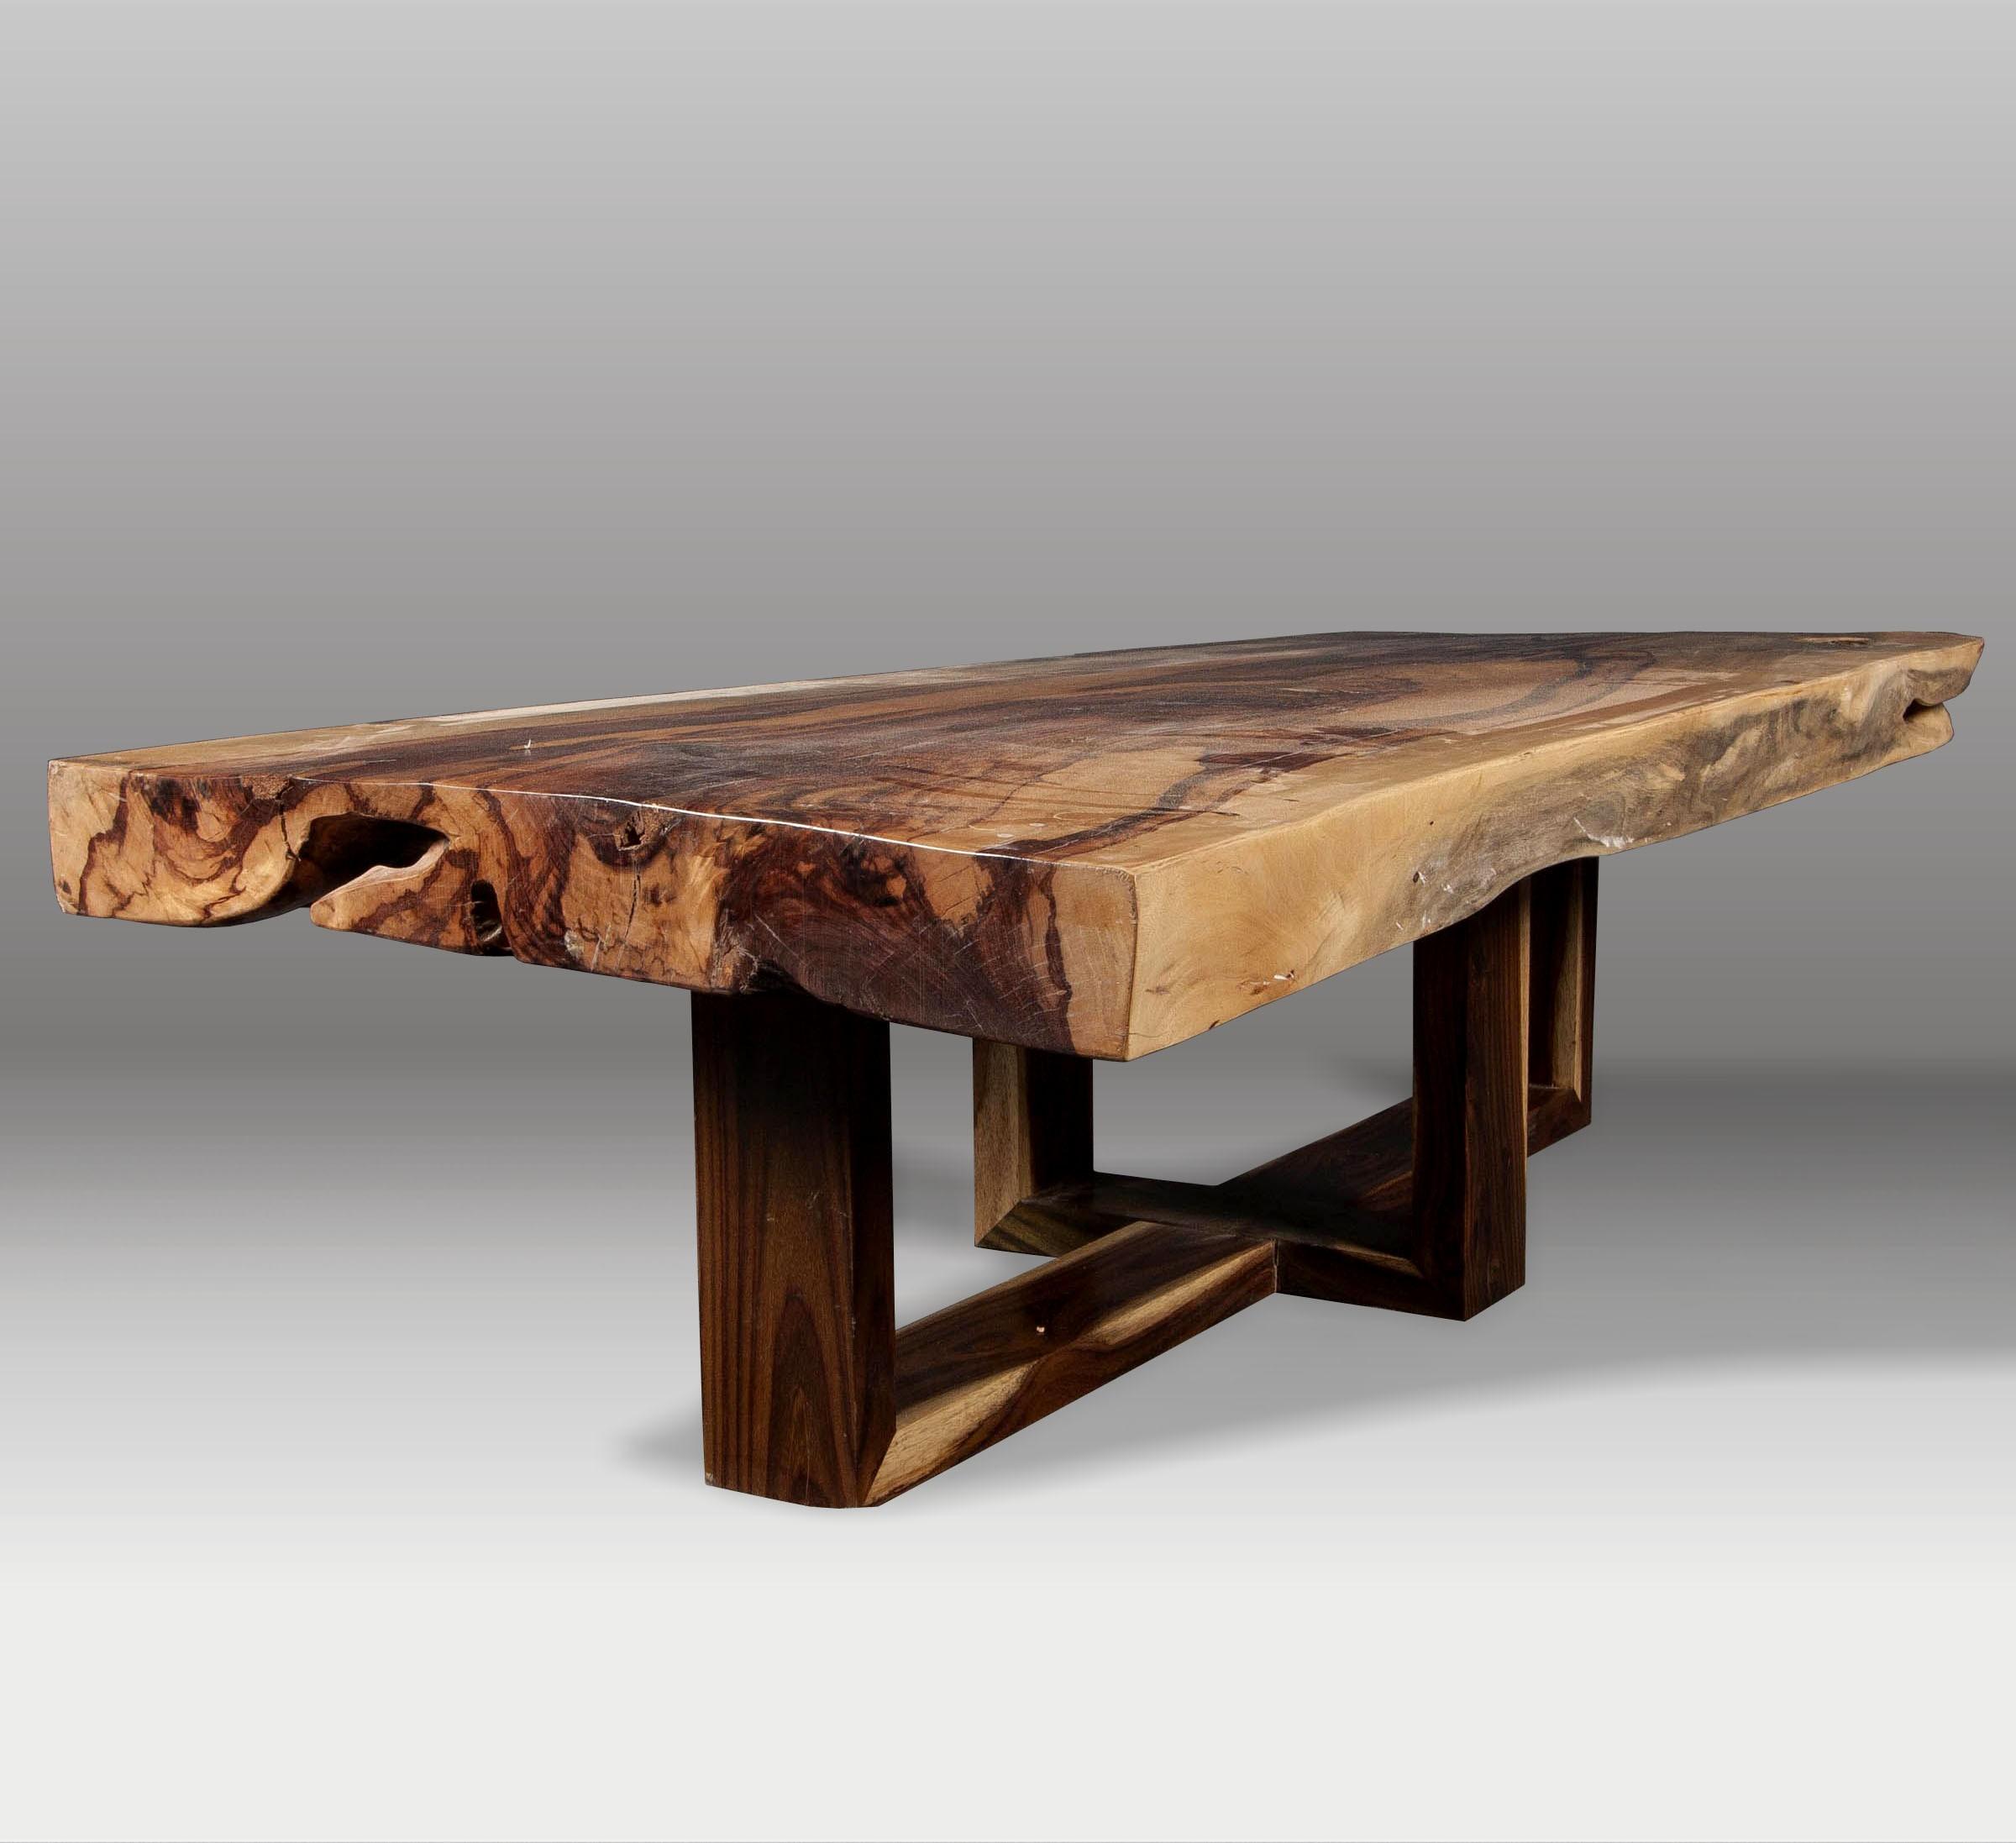 Mesa de centro y mesa de tamarindo batavia - Mesas de centro estrechas ...